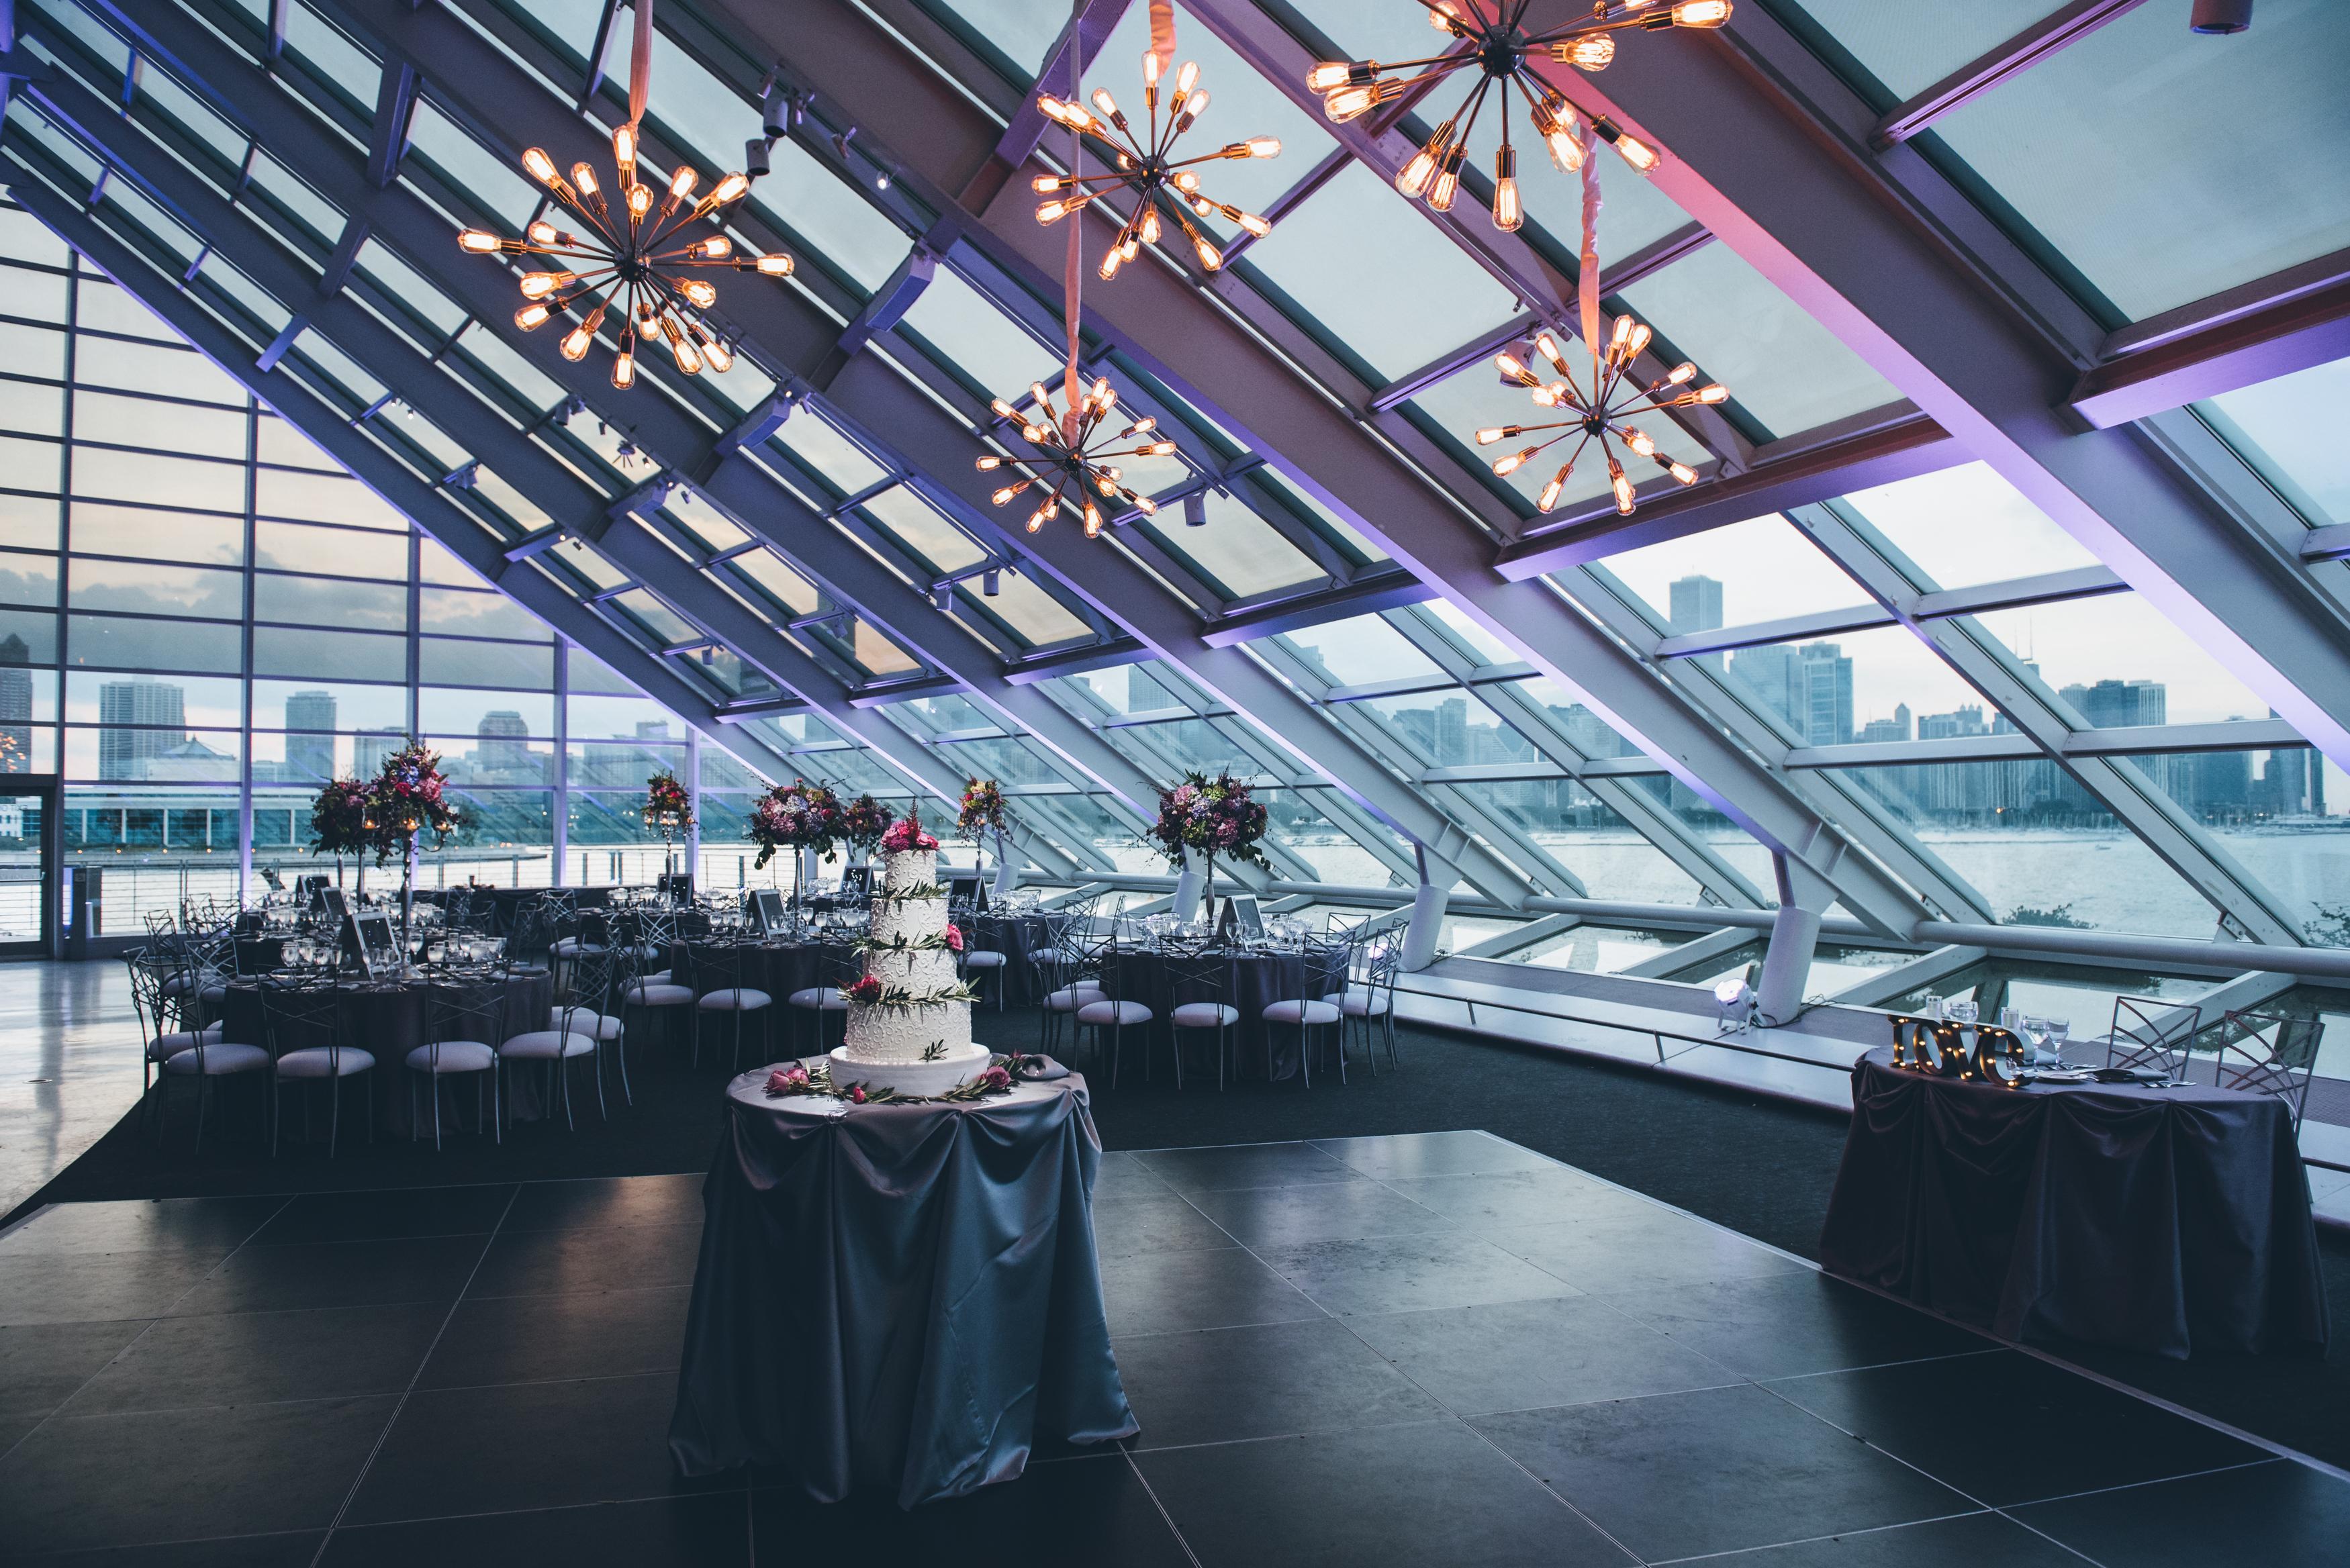 Adler Planetarium Wedding.Sputnik Chandelier At An Adler Planetarium Wedding Mdm Entertainment